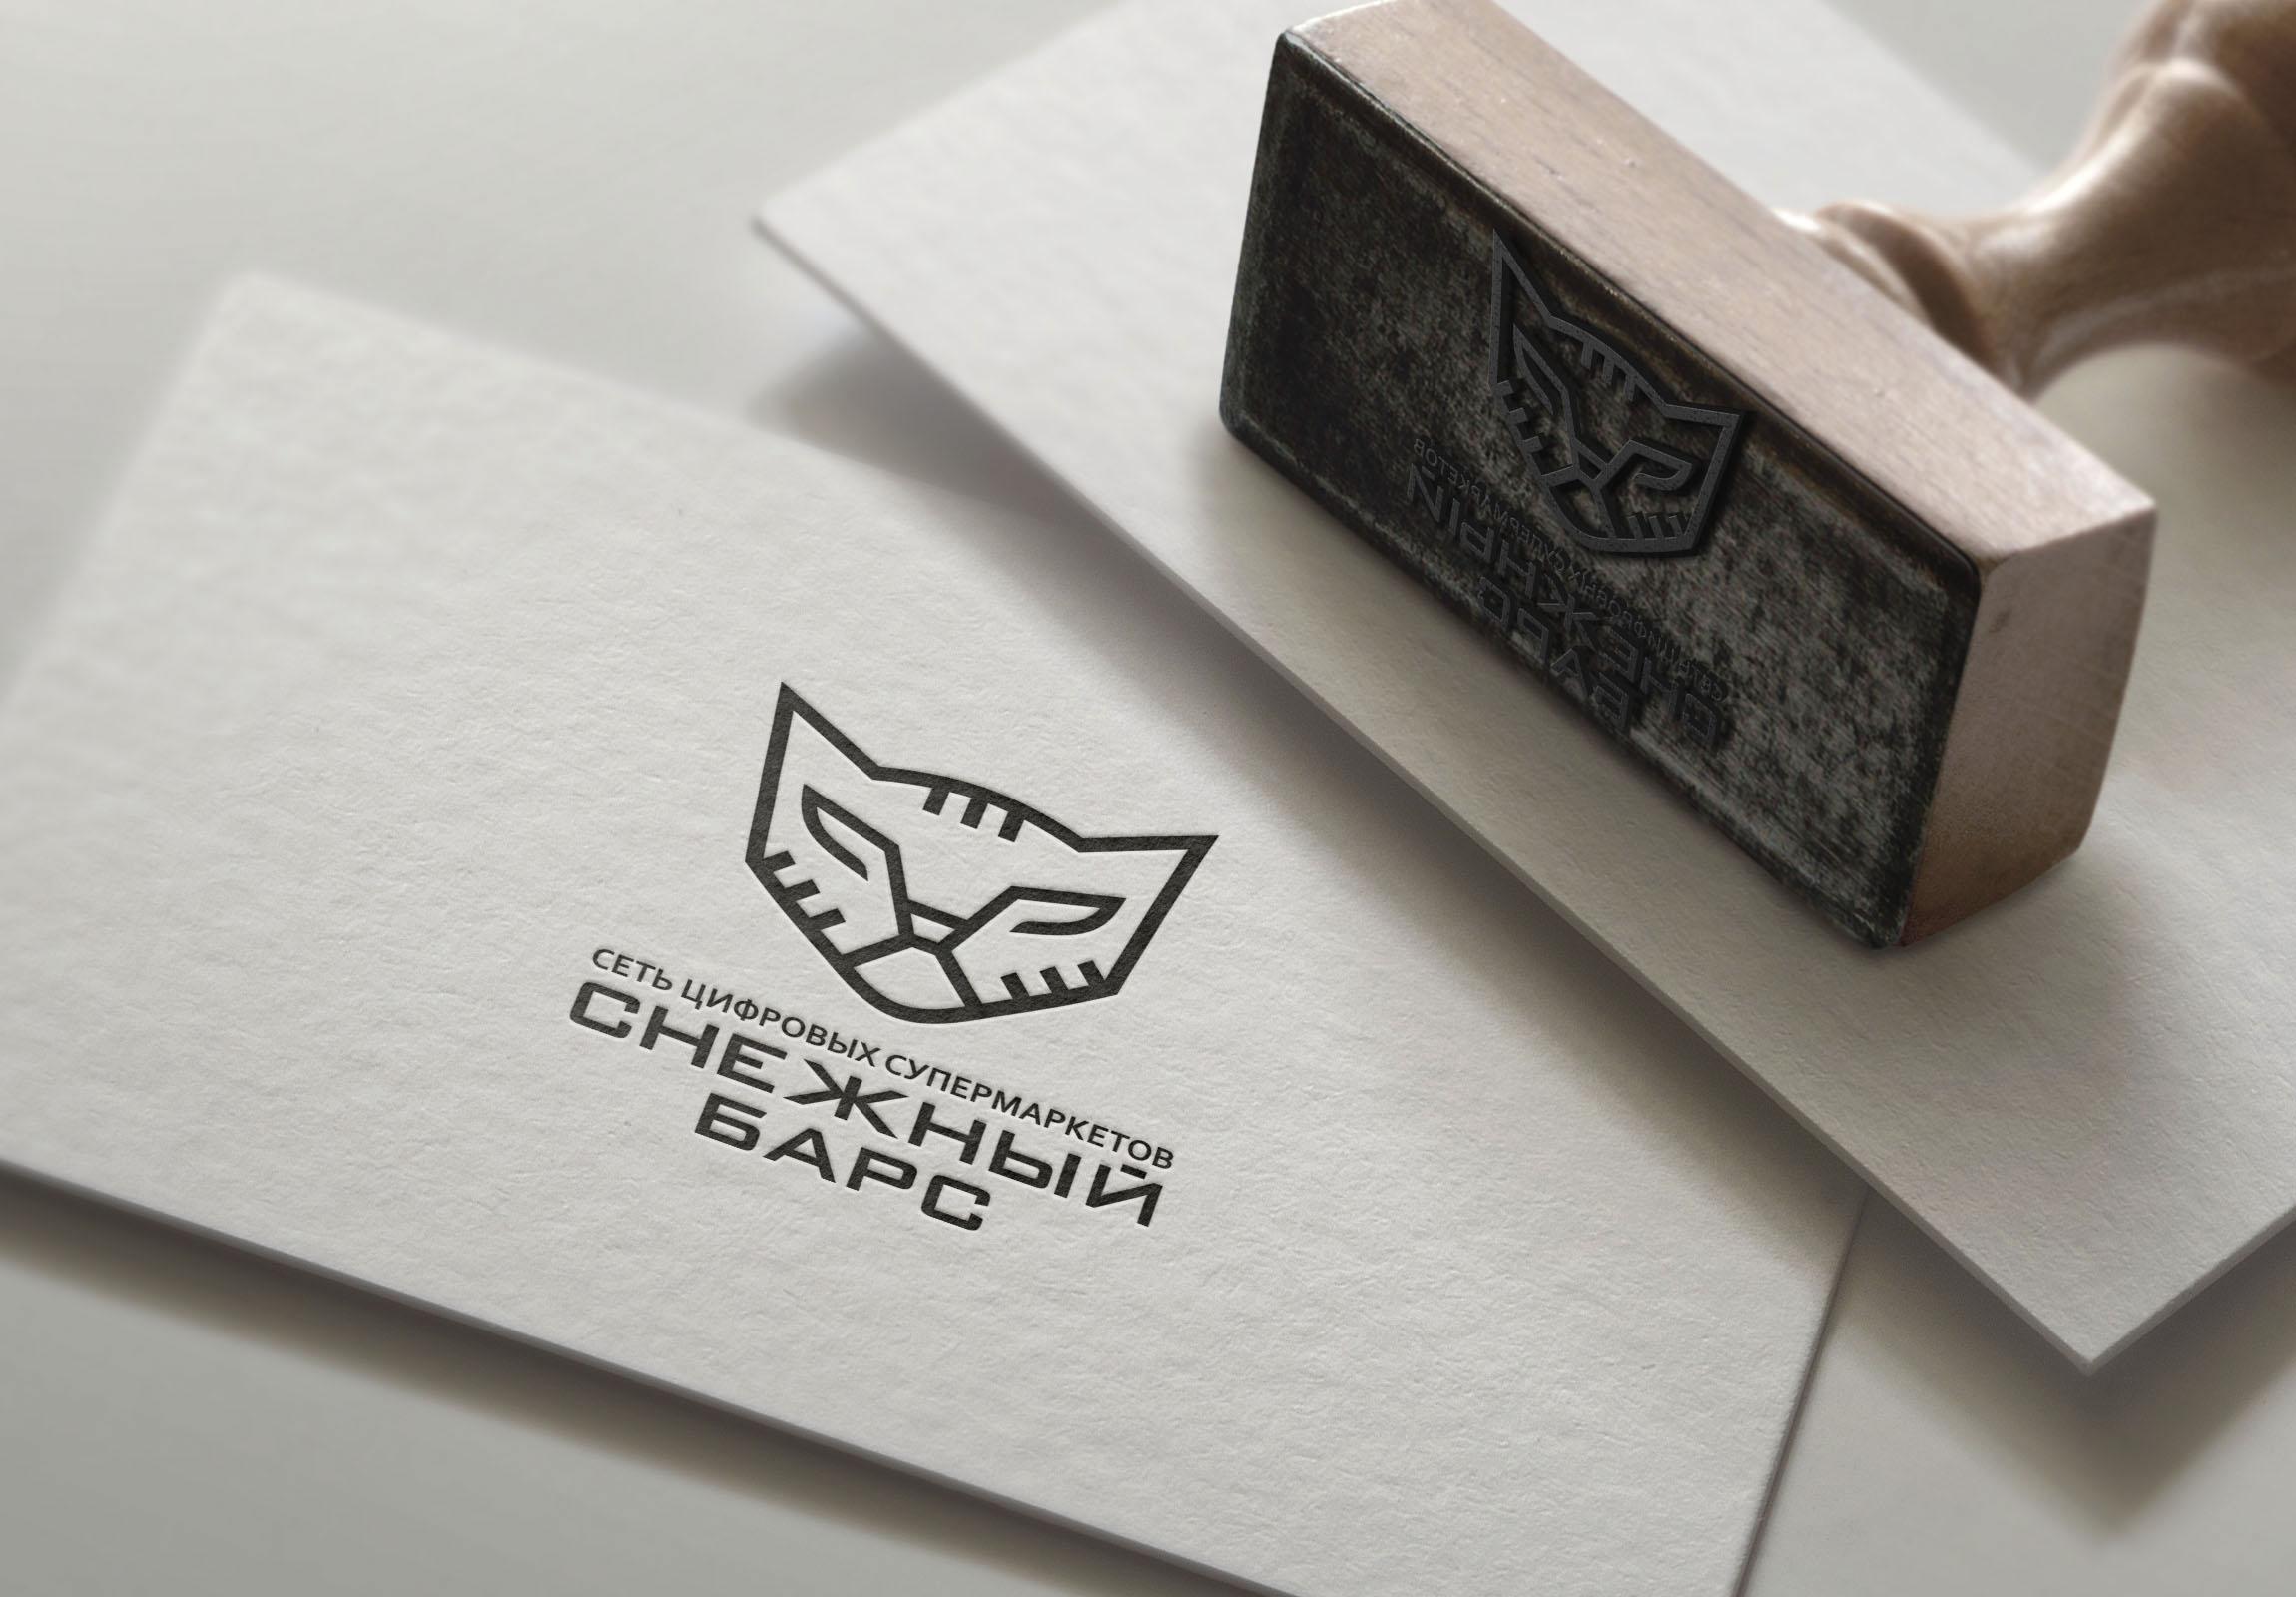 Ре-дизайн (рестайлинг) логотипа компании фото f_5665a990d797756d.jpg